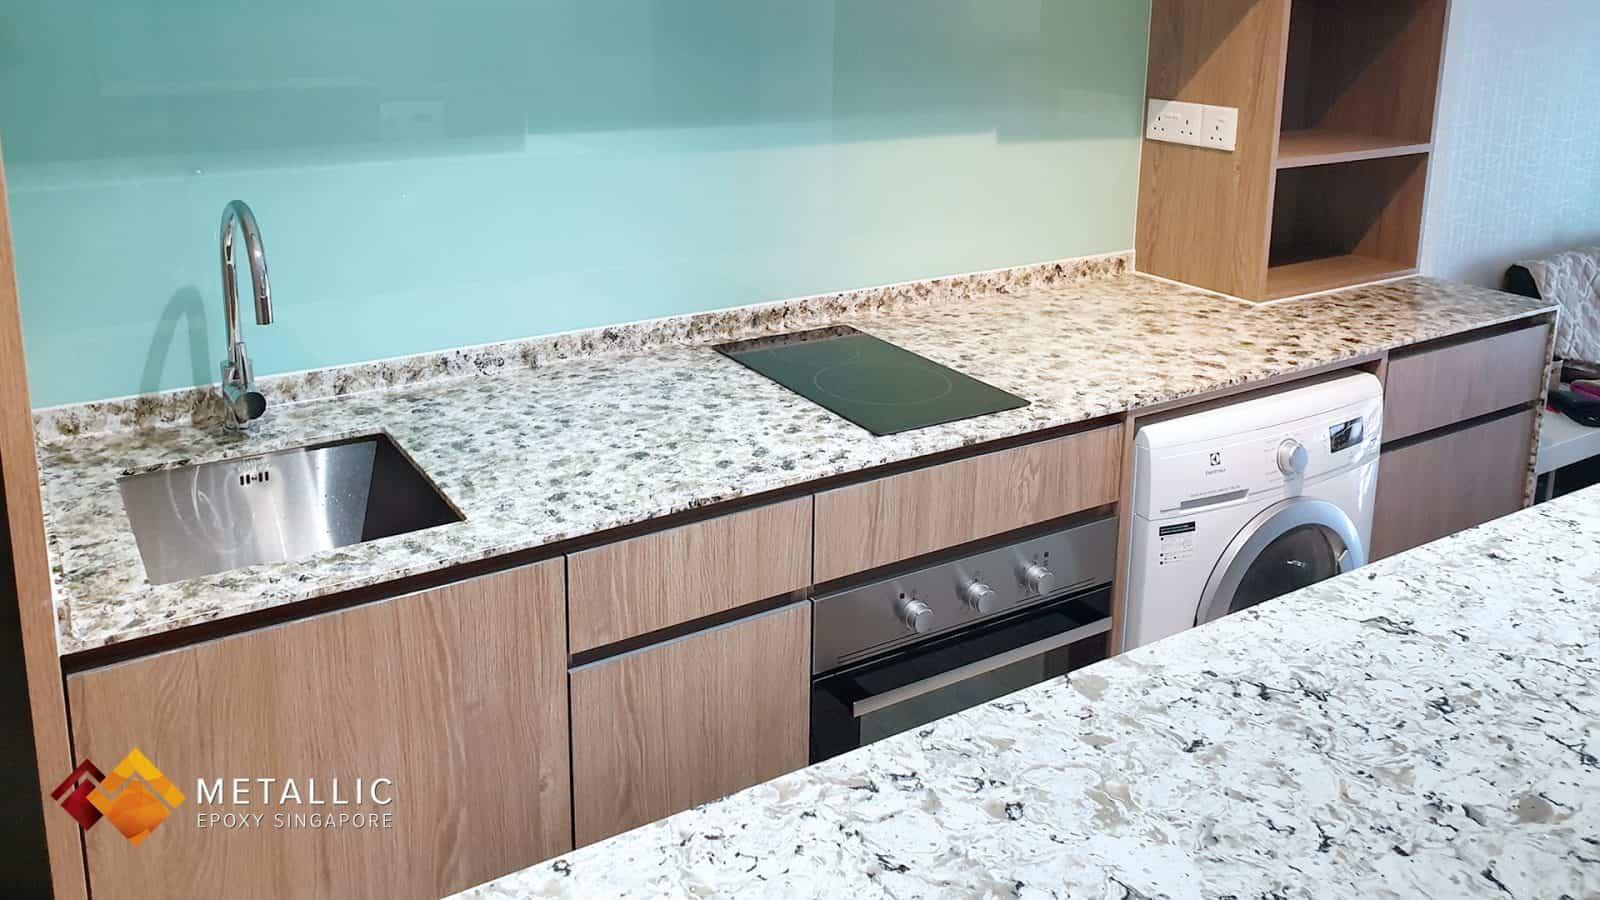 Metallic Epoxy Granite Kitchen Countertop